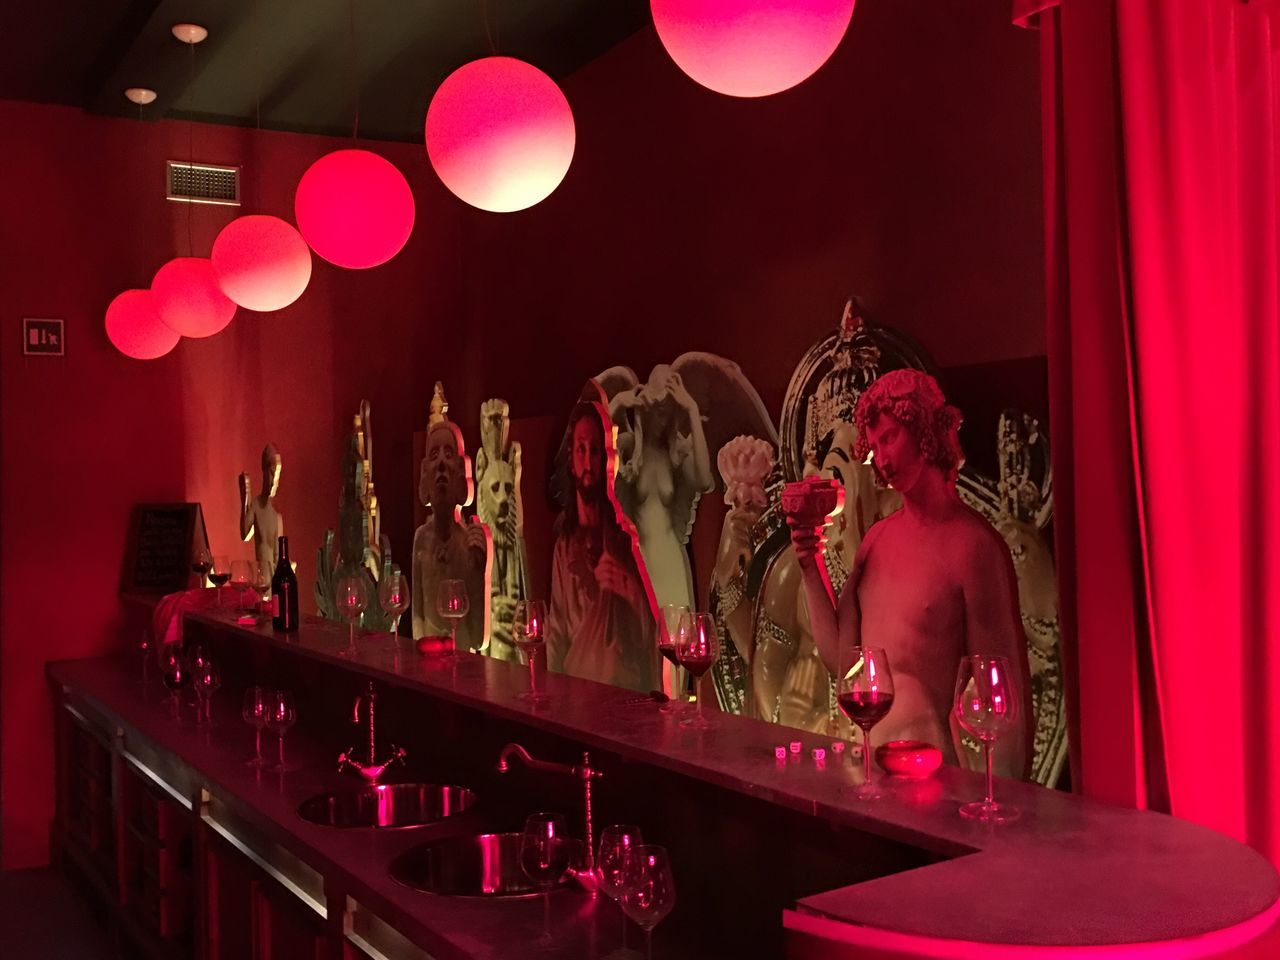 illuminated, lighting equipment, indoors, night, celebration, men, real people, women, large group of people, people